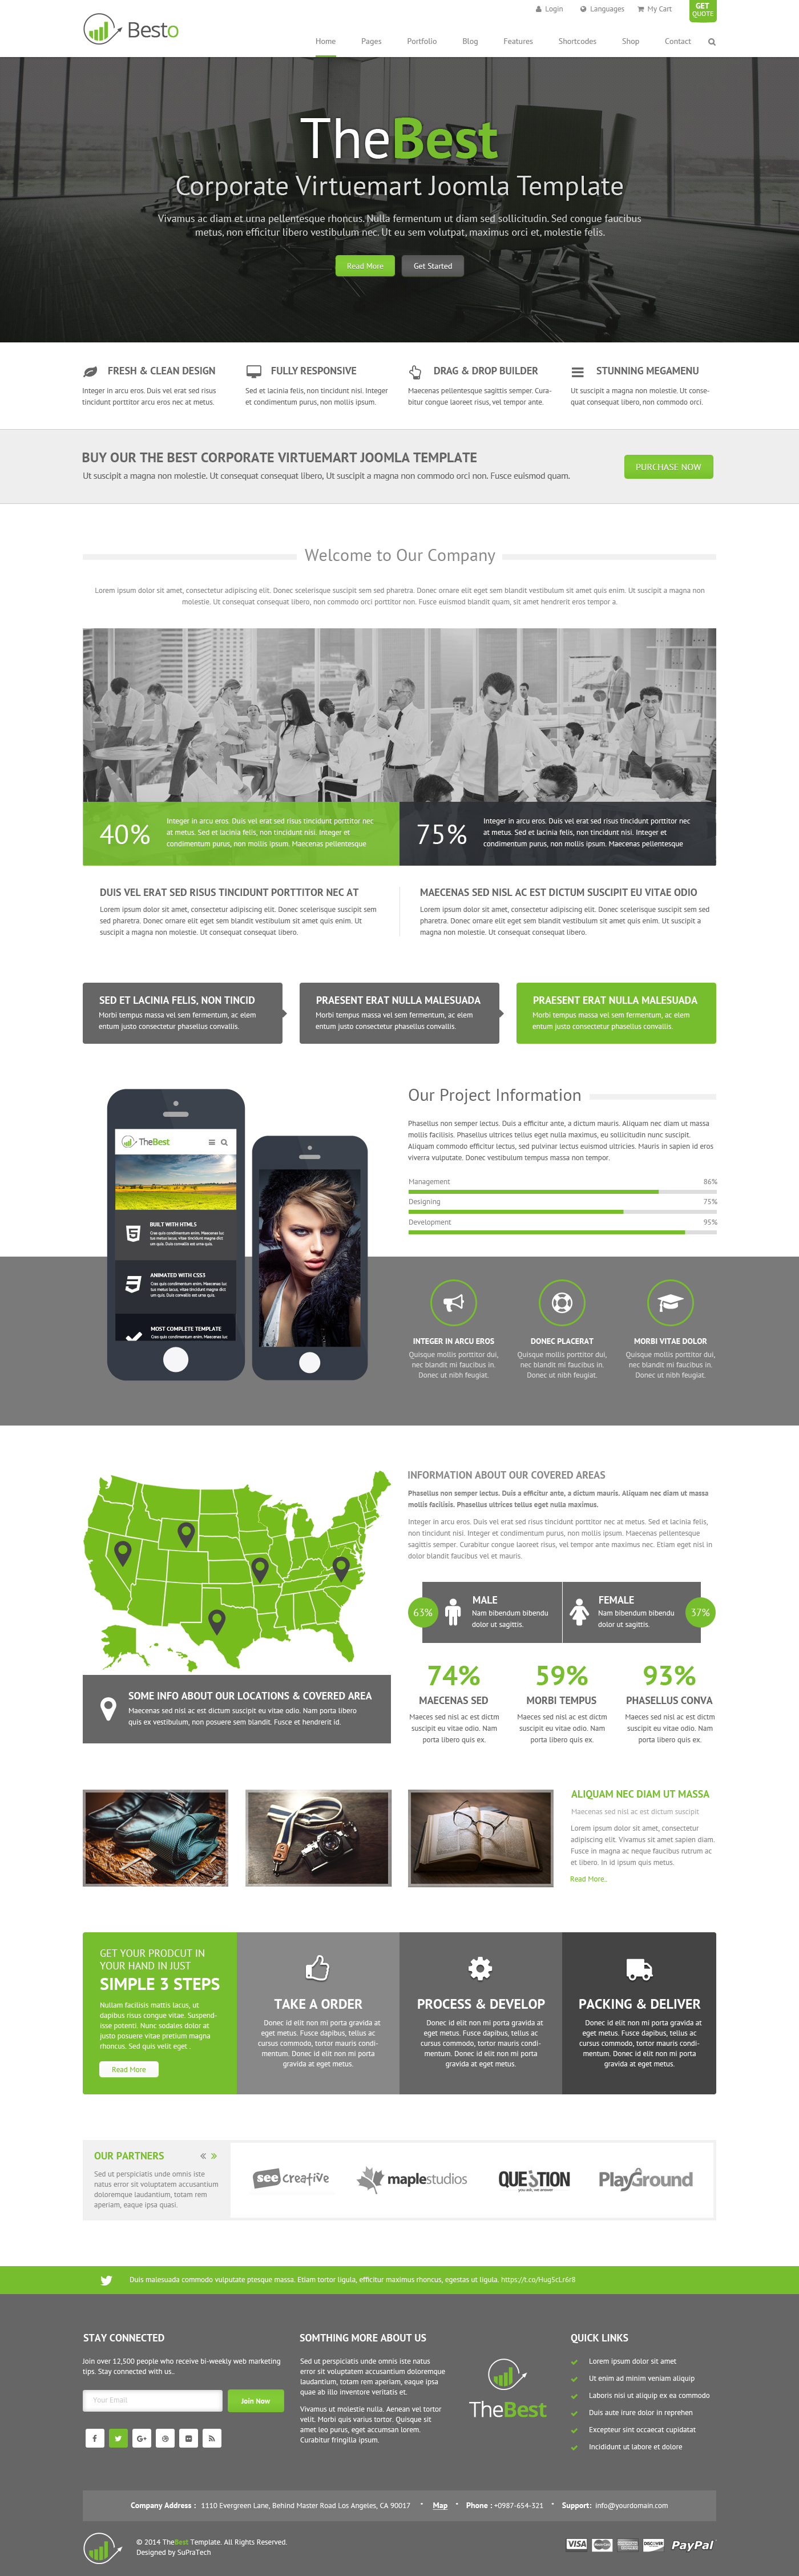 Besto - Corporate Responsive Multi Purpose WordPress Theme by SuPraTech